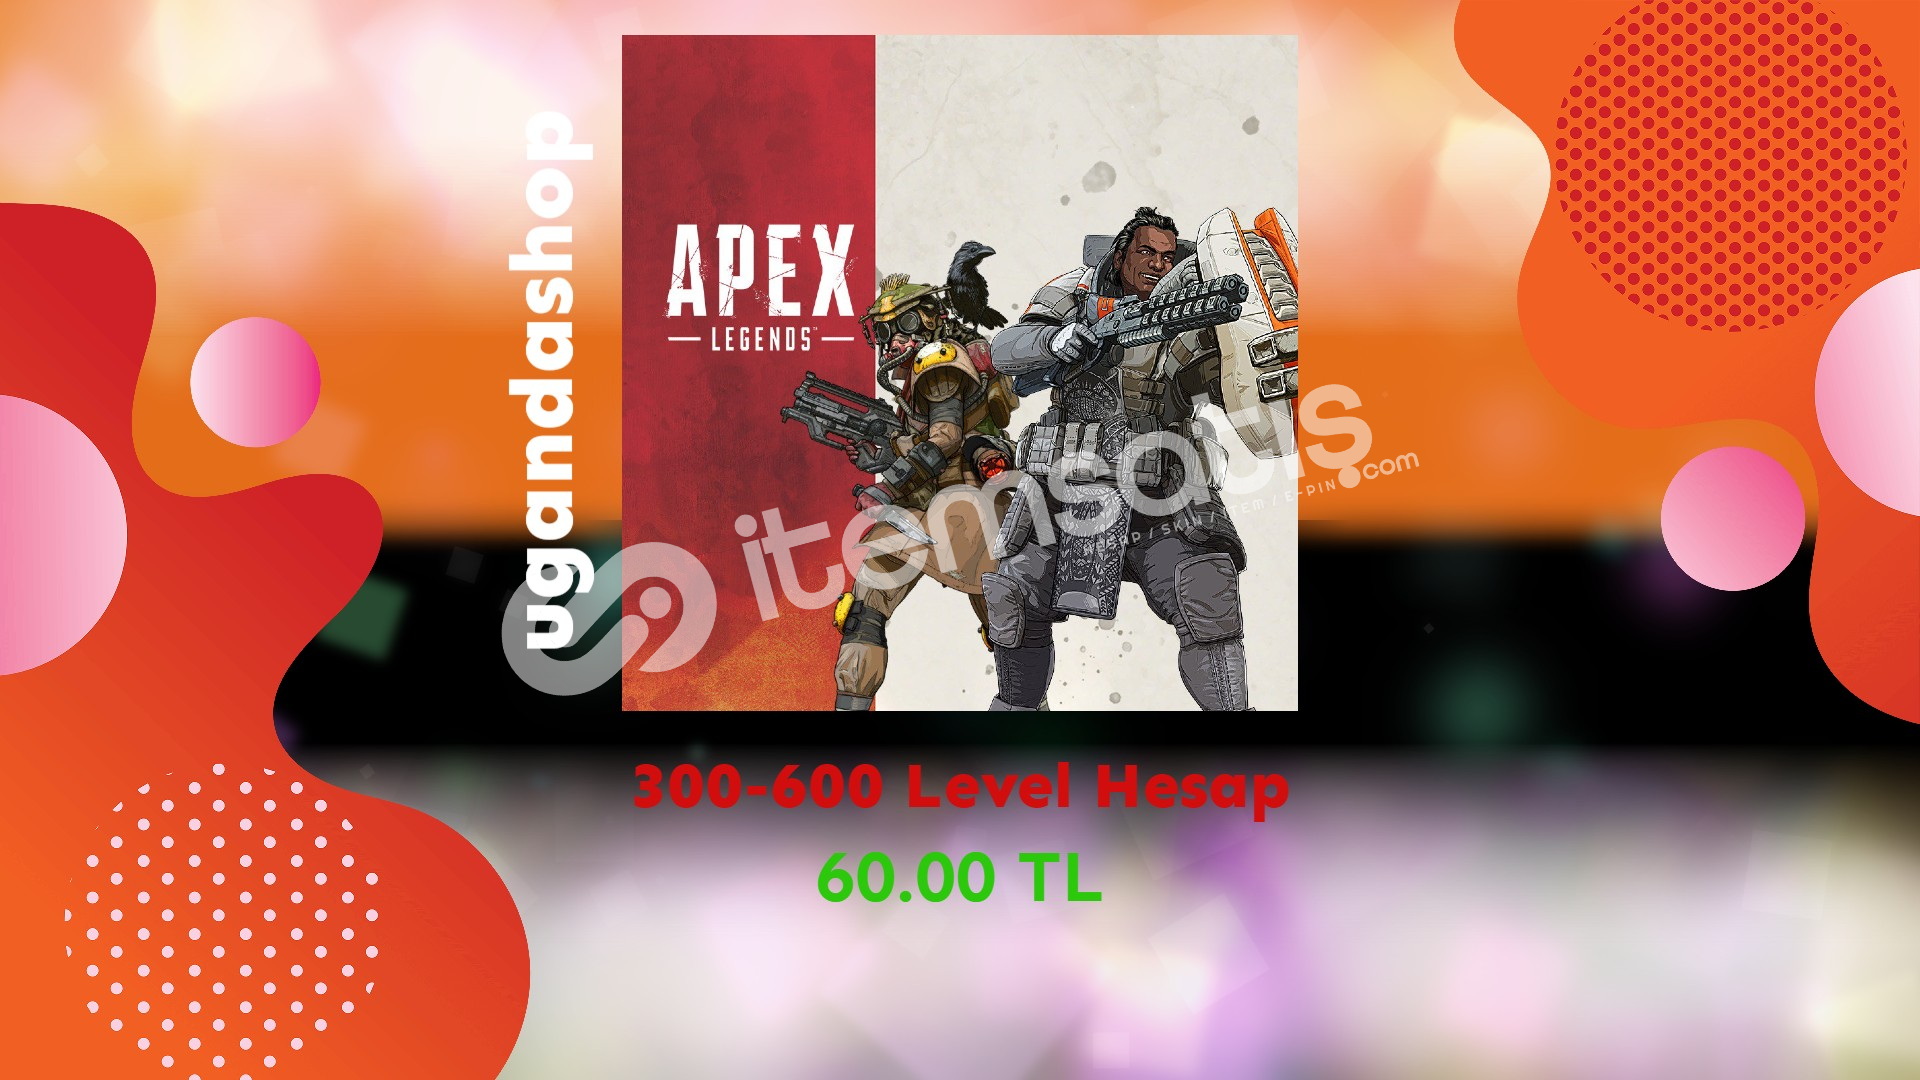 Apex Legends 300-600 Level Hesap + Garanti